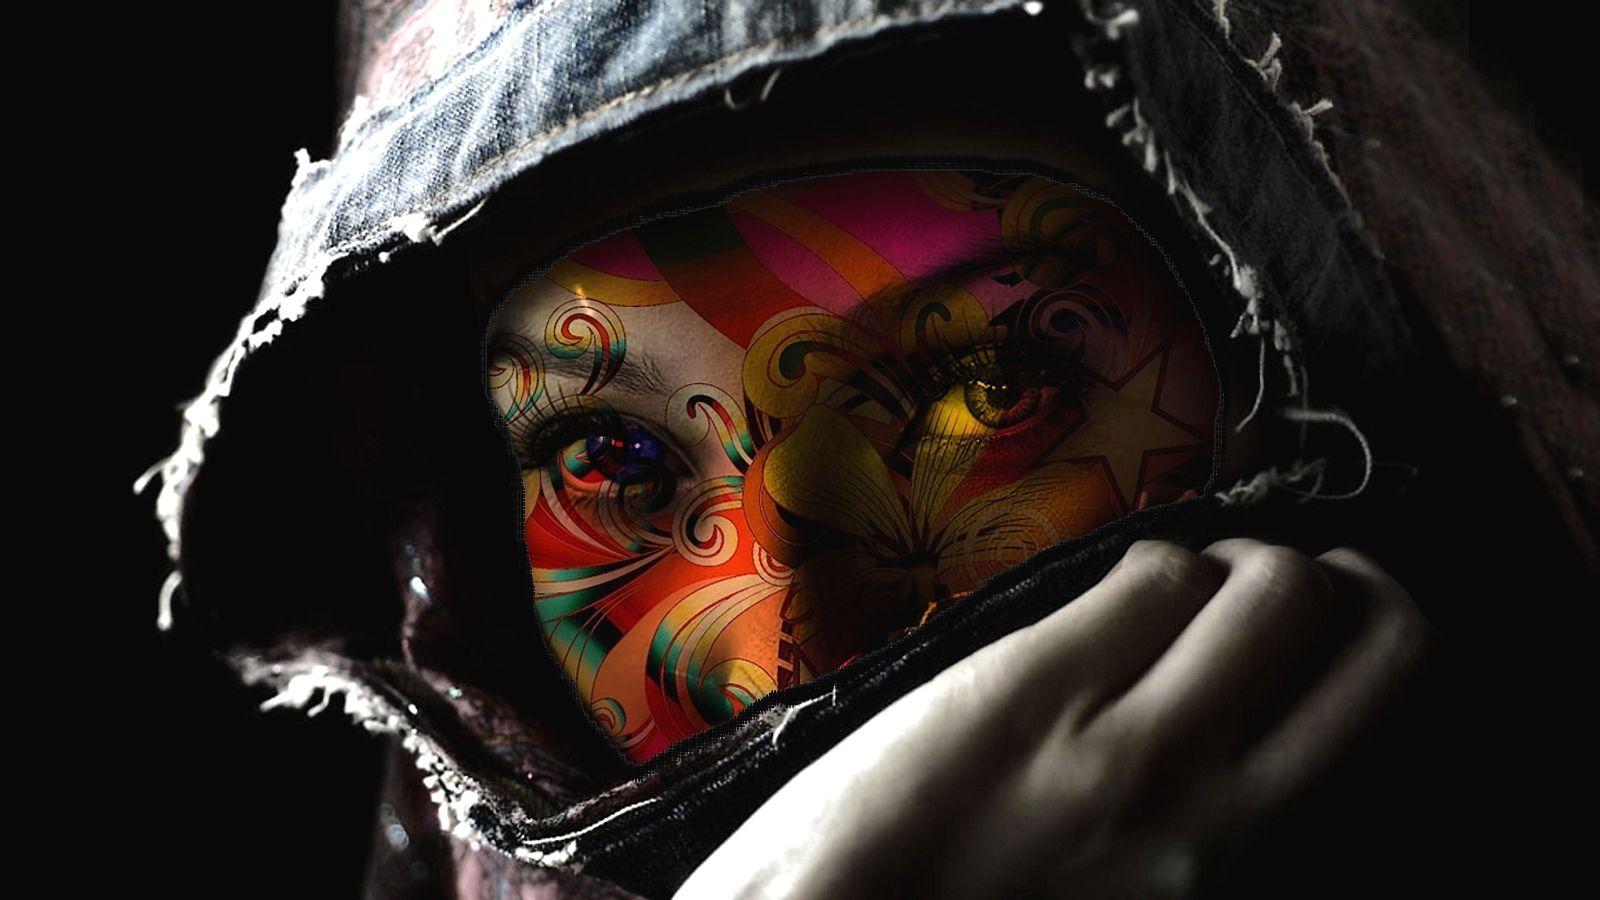 Vvv Tattoo Background Artist Wallpaper Pictures